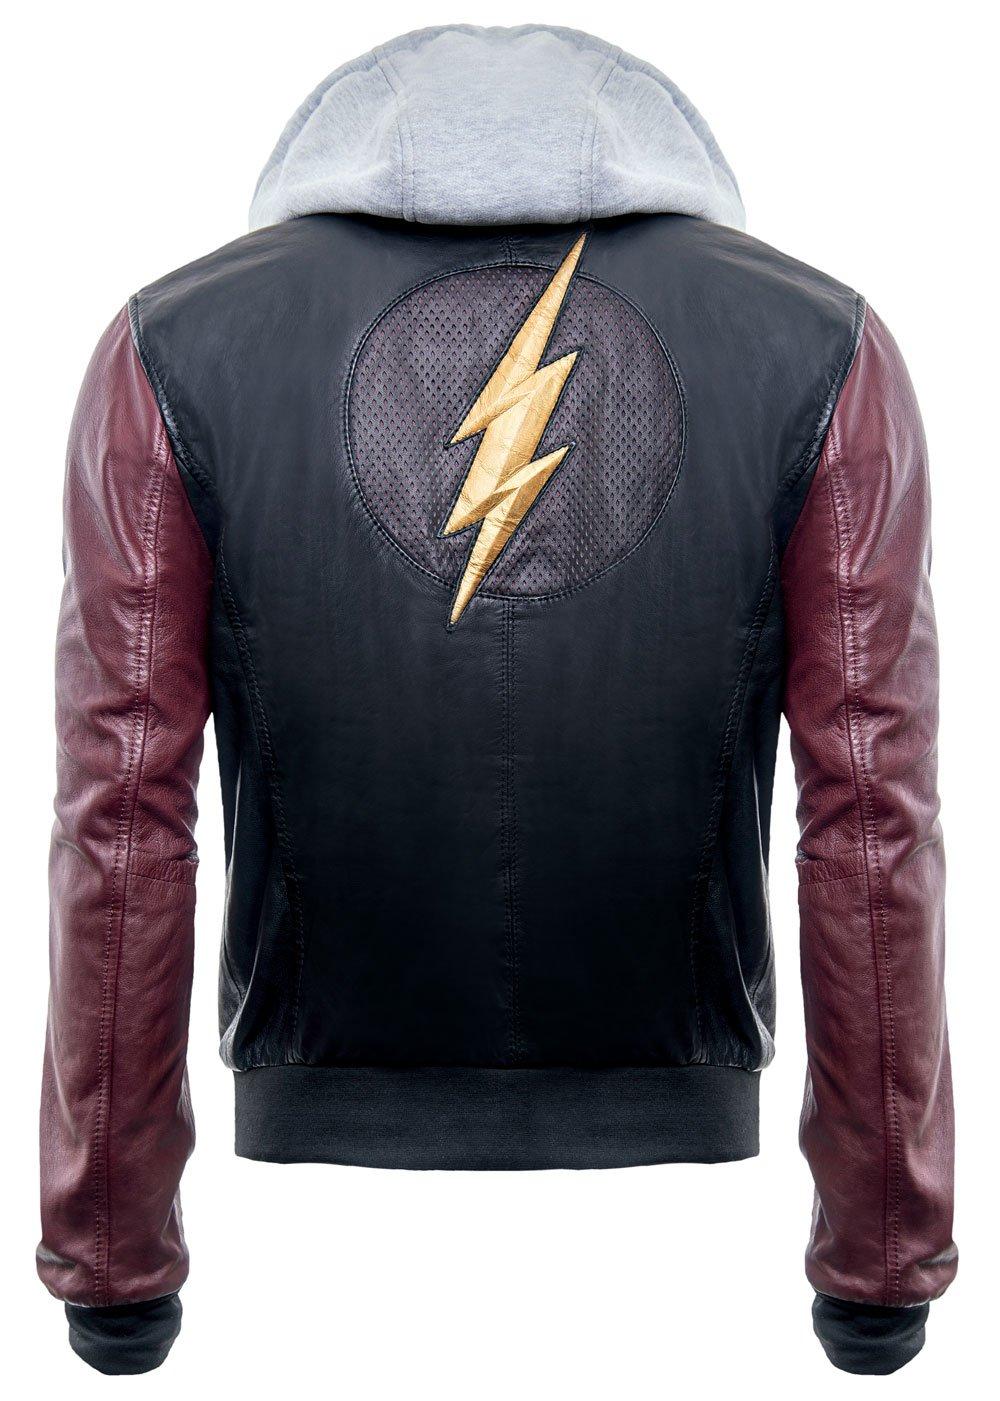 Justice League DC Comics Superhero Flash Hoodie Black Real Leather Mens Jacket (Medium)